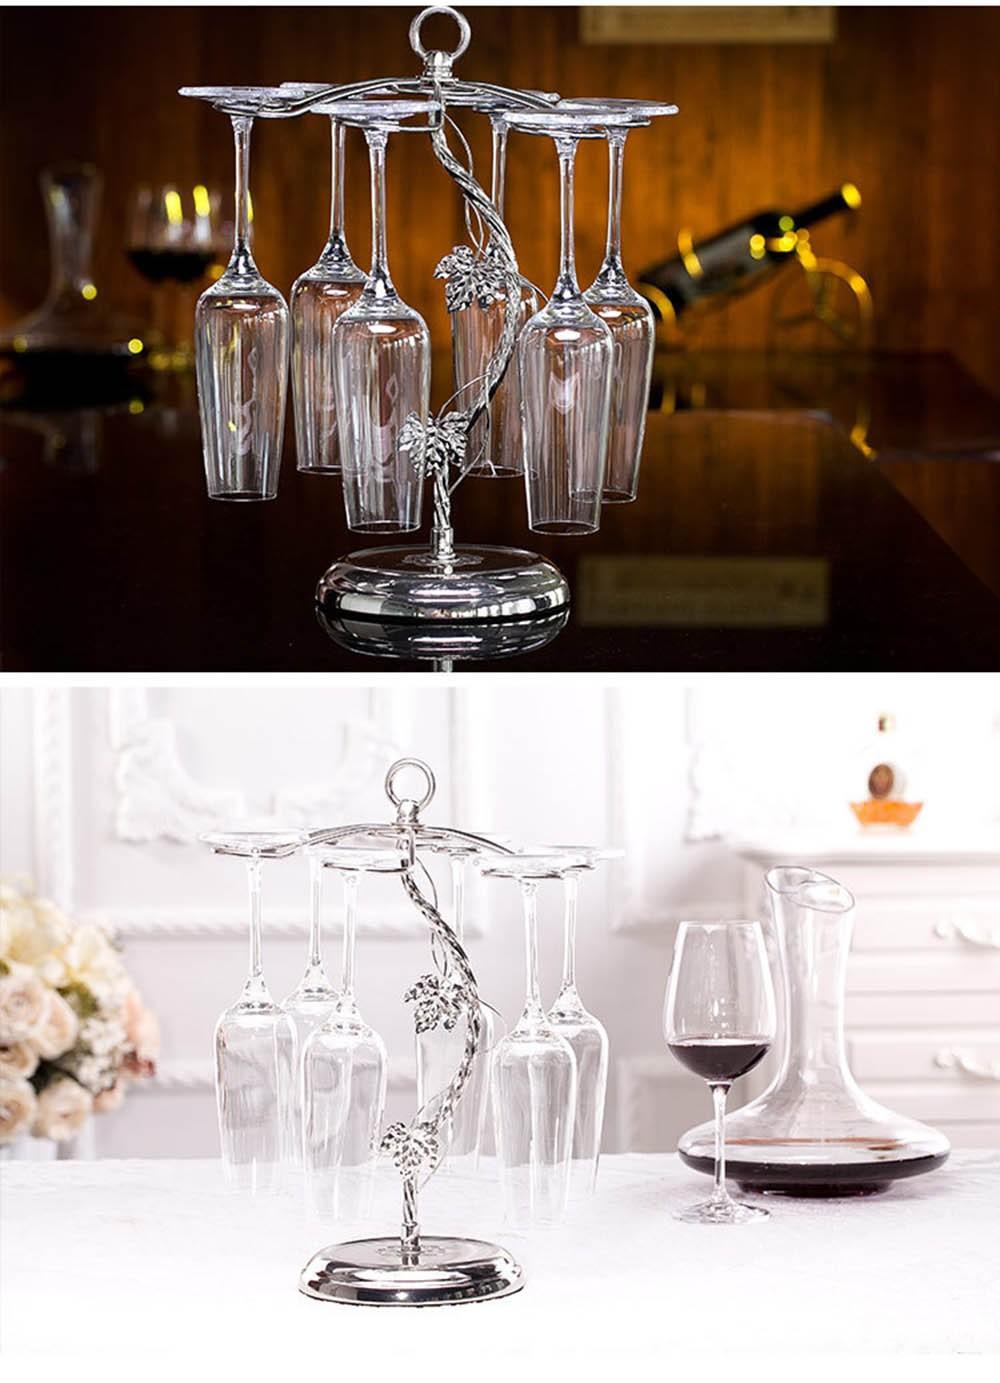 Fashion Decorative Metal Modern Hanging Wine Glass Racks Wine Cabinet Wedding Decor Gift Wine Glass Holder Wine Accessories KC1284 (10)